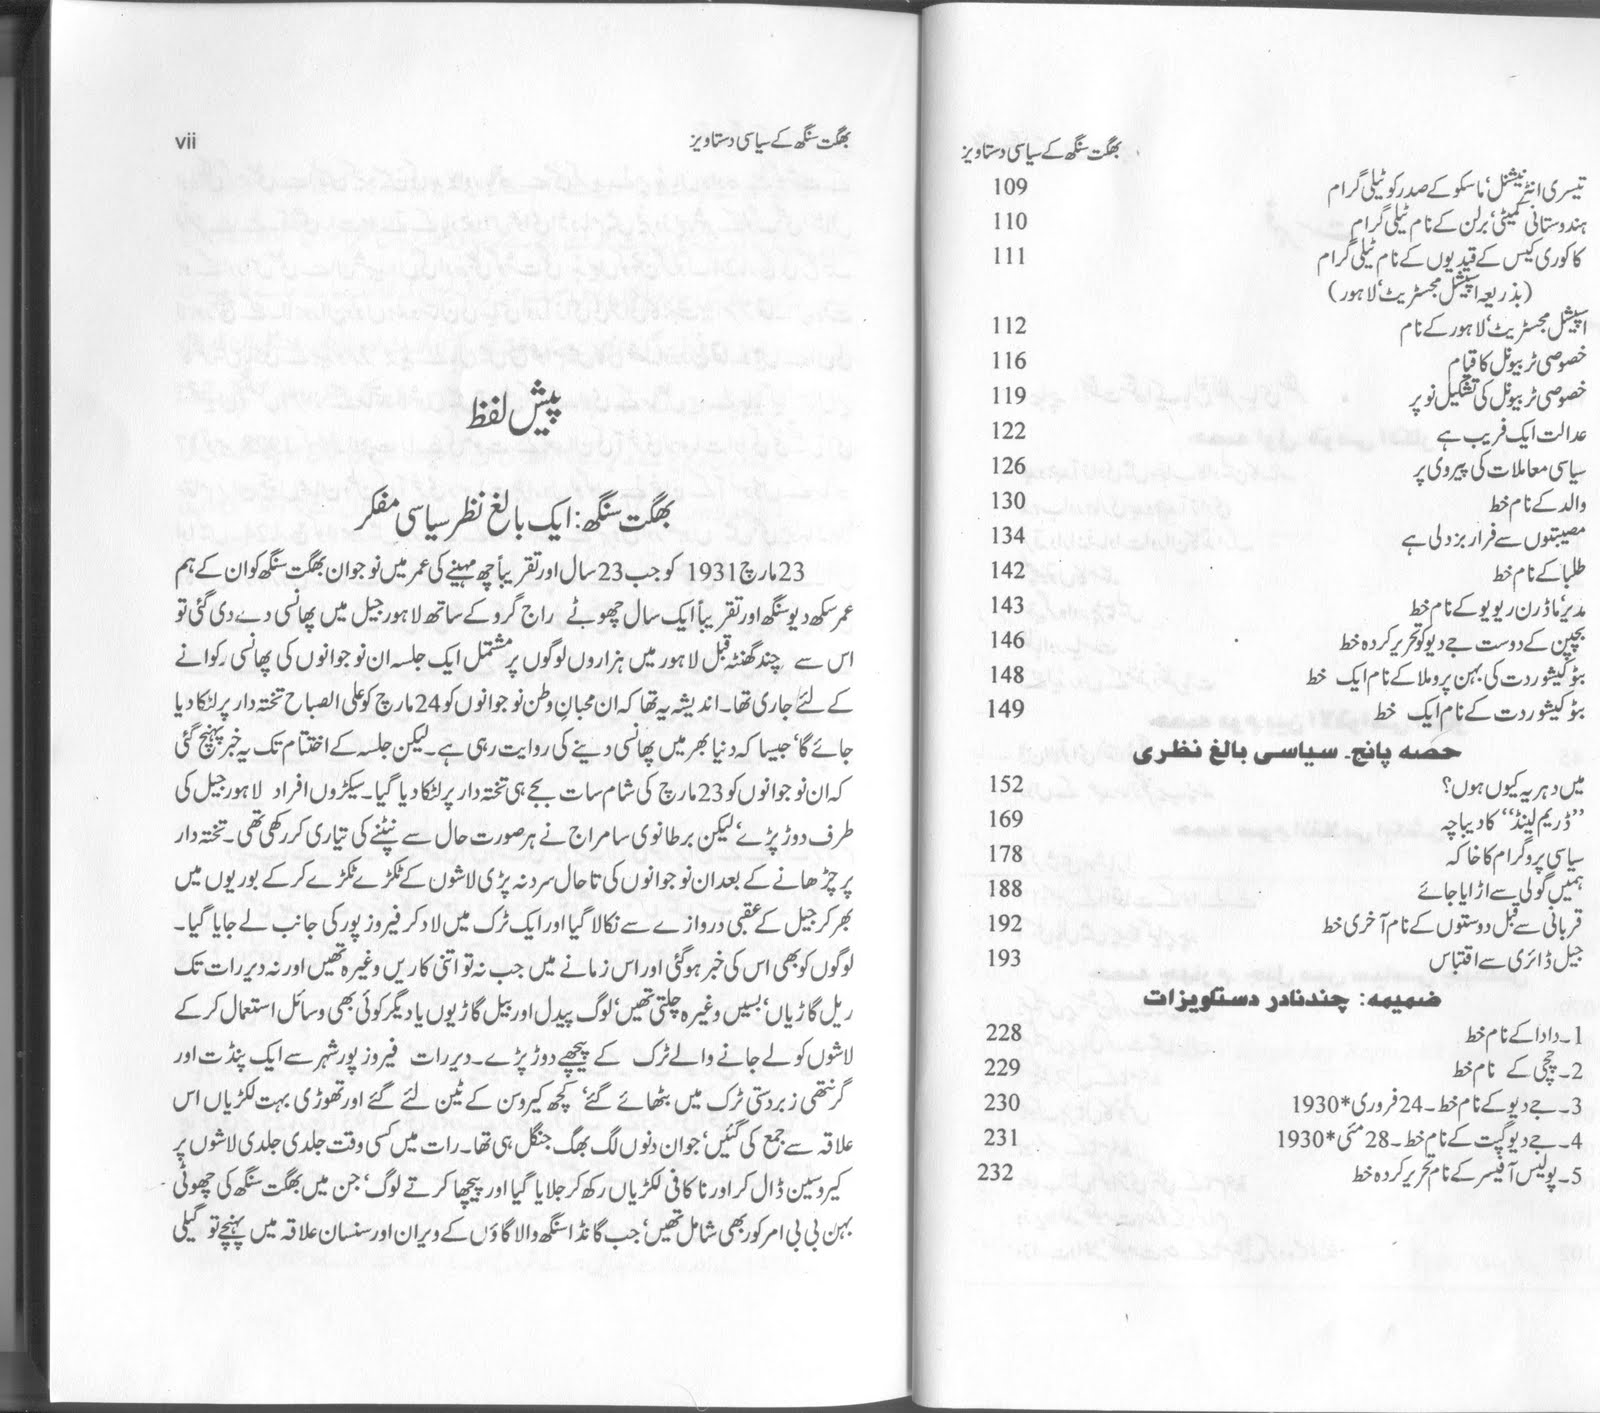 essay on bhagat singh in punjabi order paper bhagatsinghstudy pot com bhagat singh